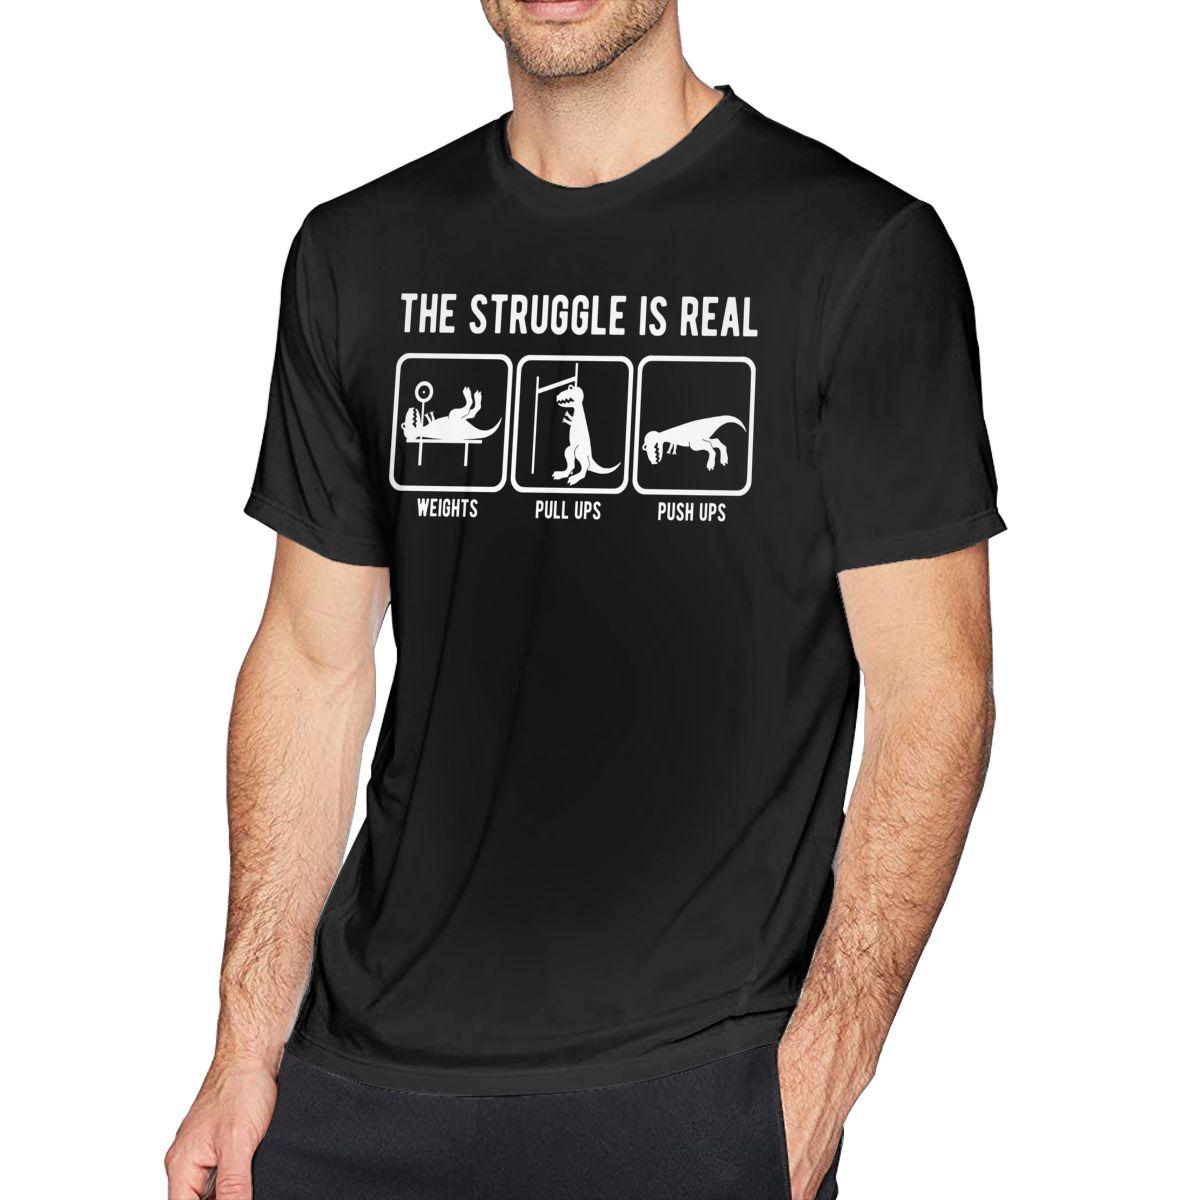 T-rex t camisa a luta é real t-rex ginásio treino camiseta impressionante 100 algodão camiseta casual tshirt